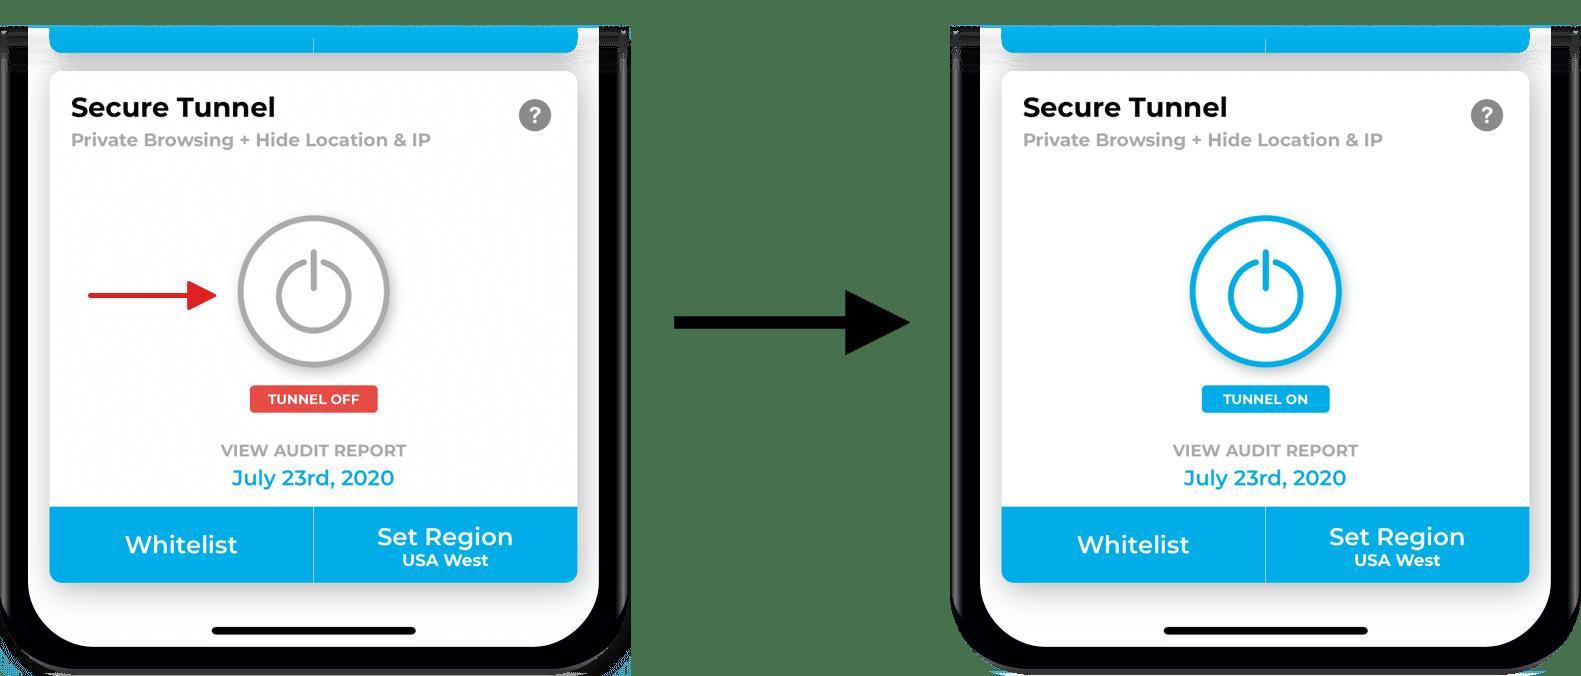 Secure Tunnel screenshots from Lockdown